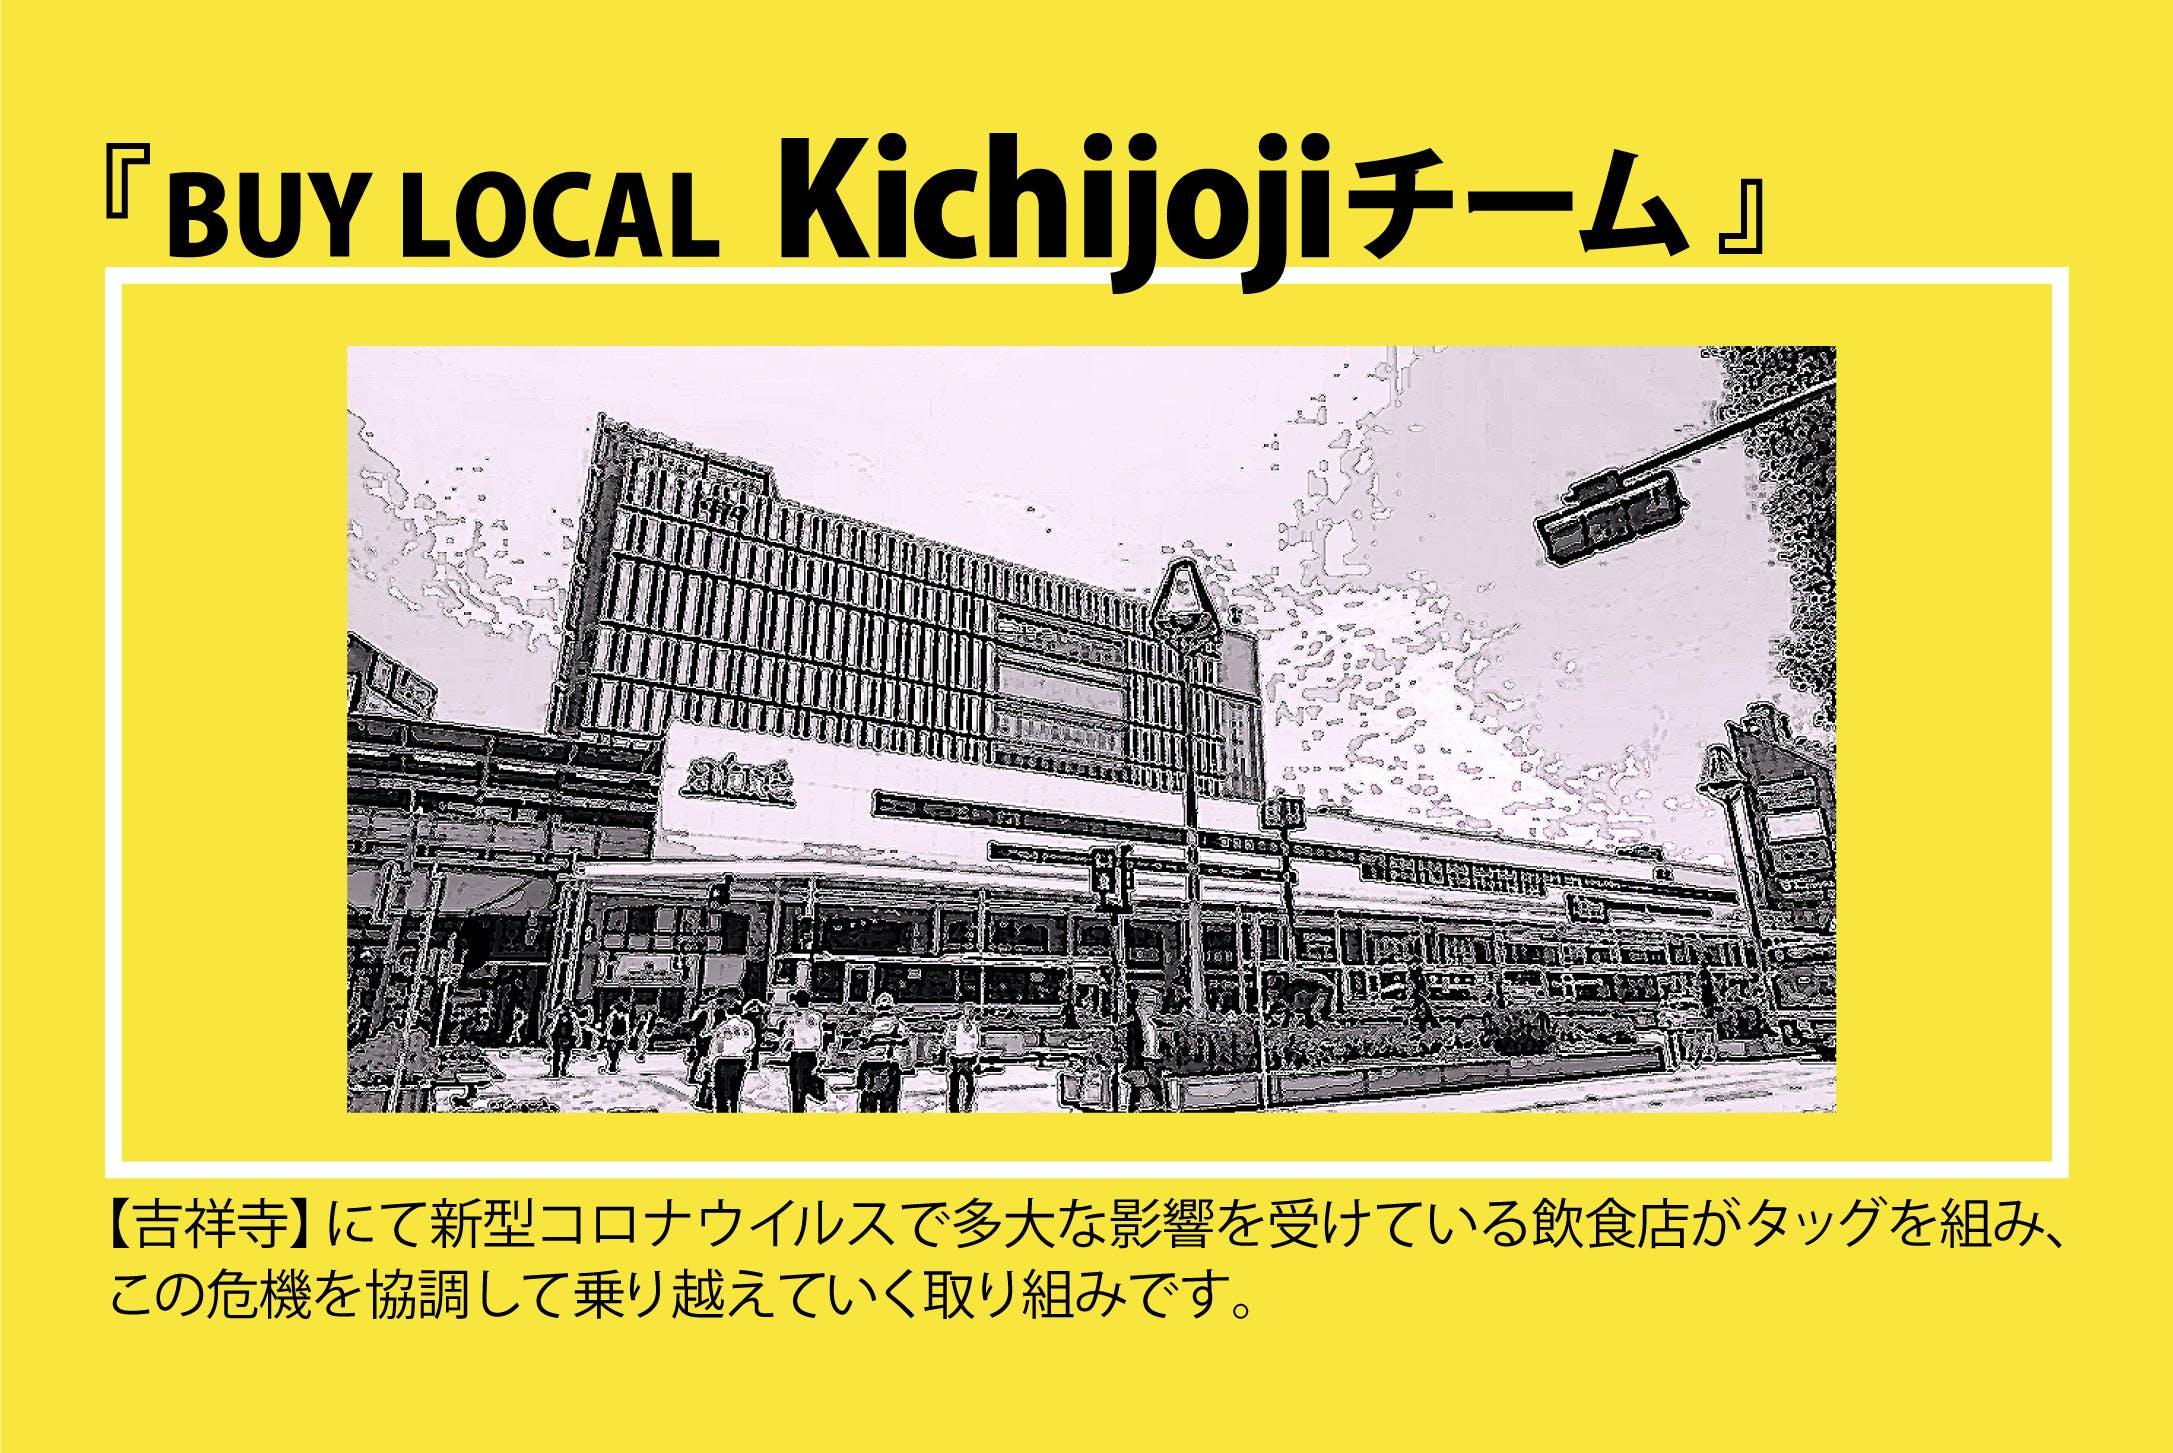 buylocal吉祥寺チーム